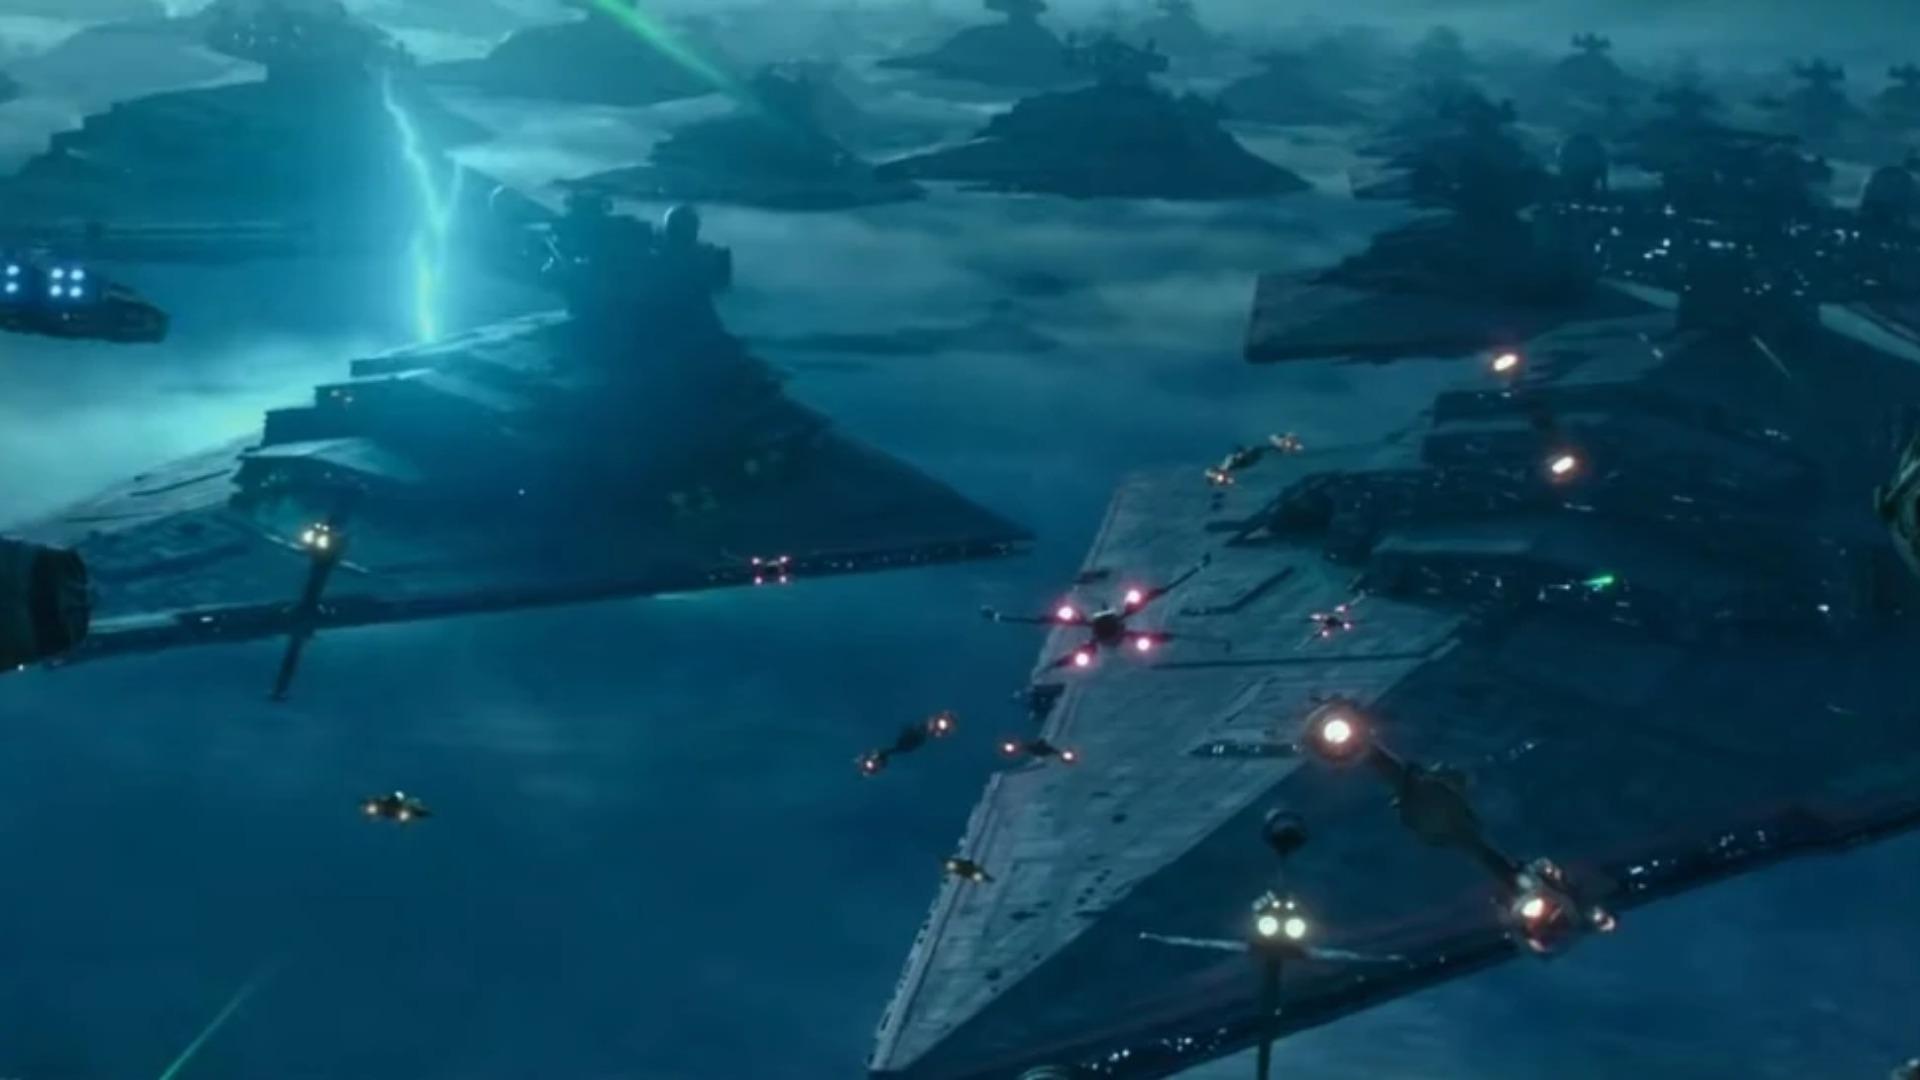 New Star Wars The Rise Of Skywalker Concept Art Reveals A Very Different Star Destroyer Gamesradar